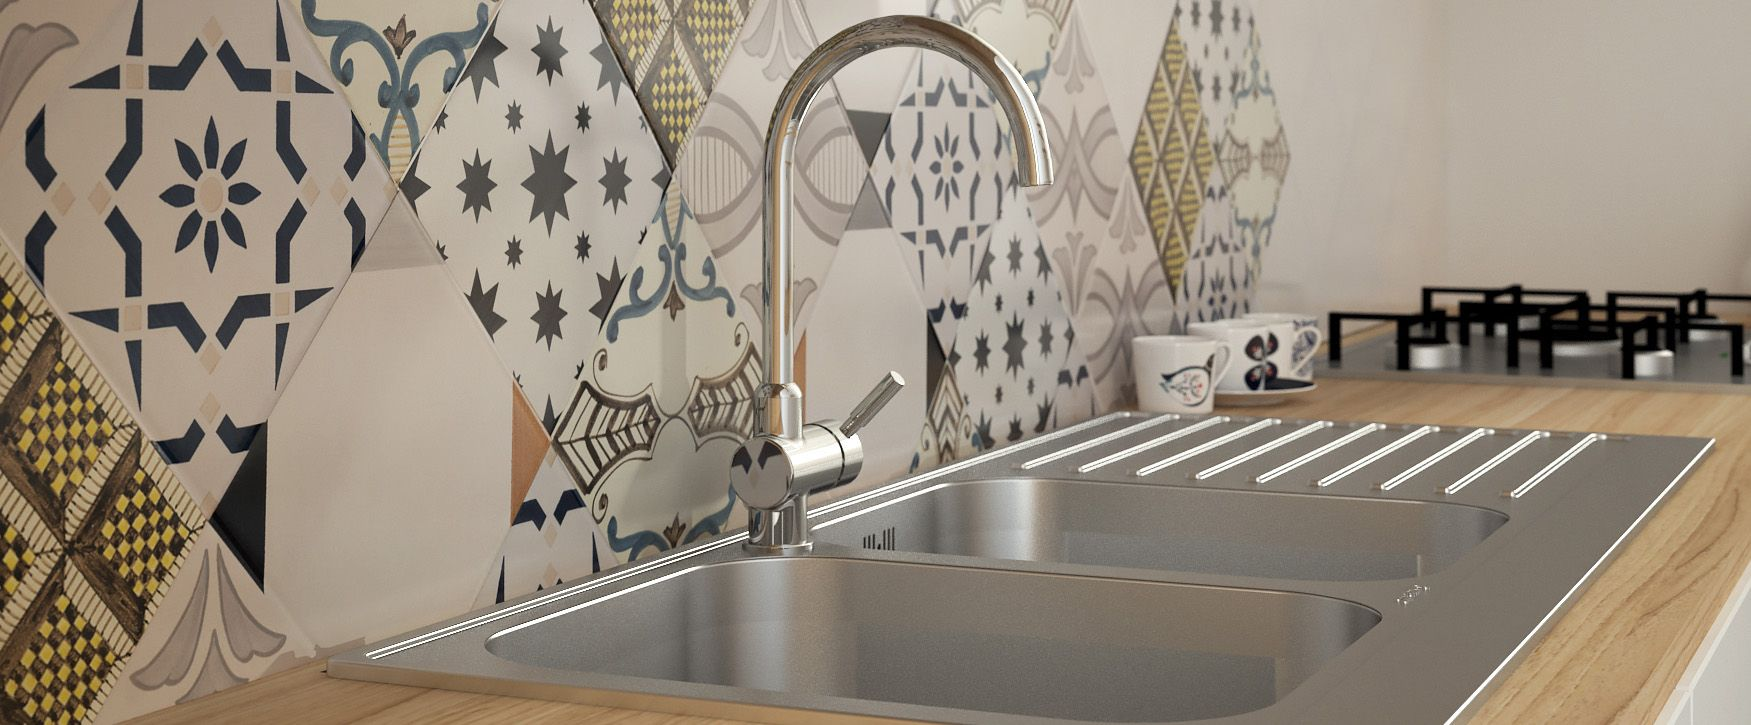 Paraschizzi originali per un nuovo look al piano cucina